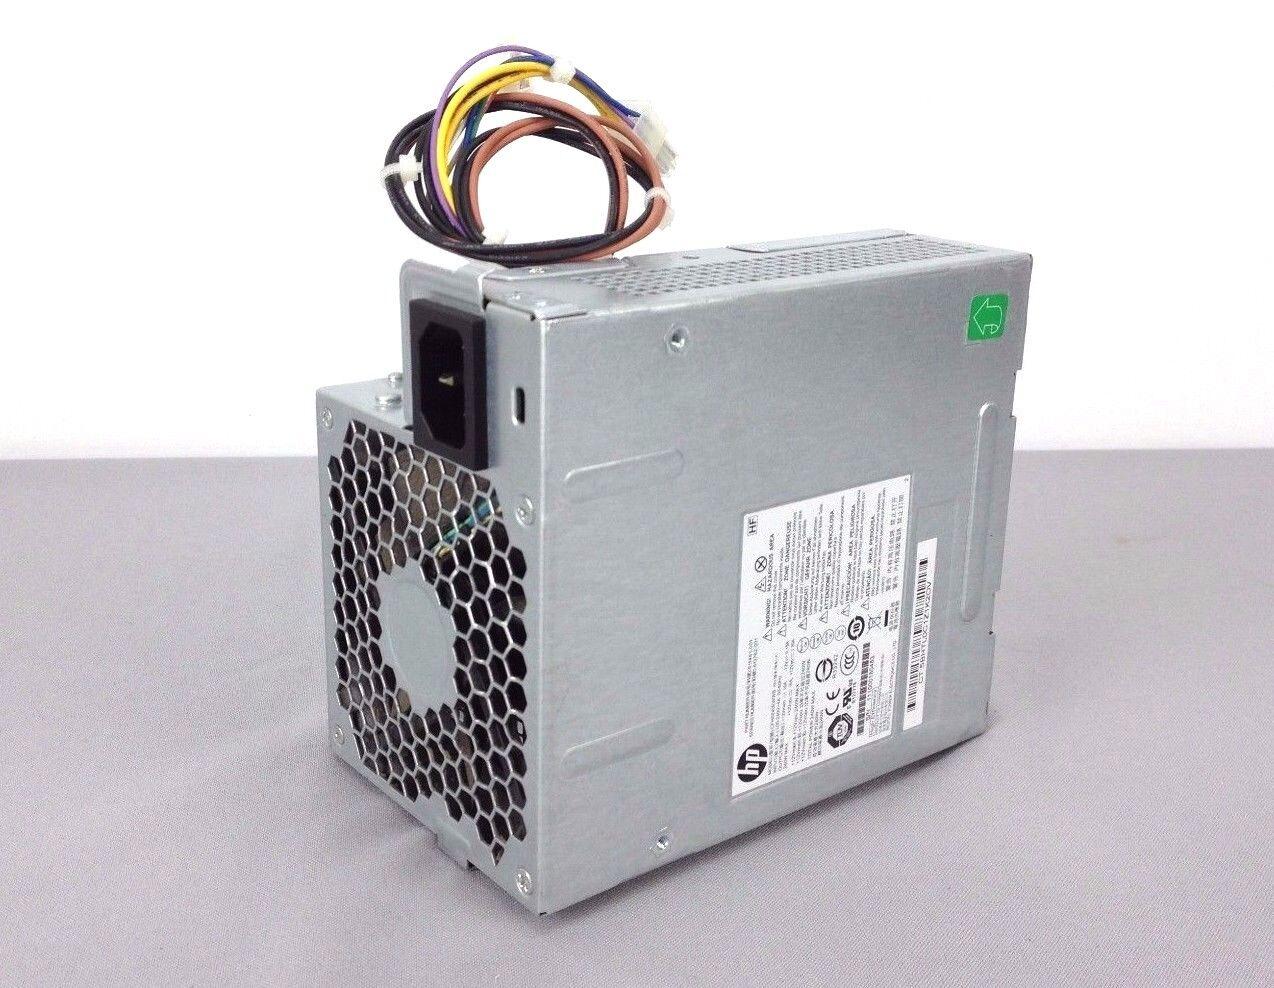 Digium PWR2401BLF PSU Bracket Power Supply for FXS